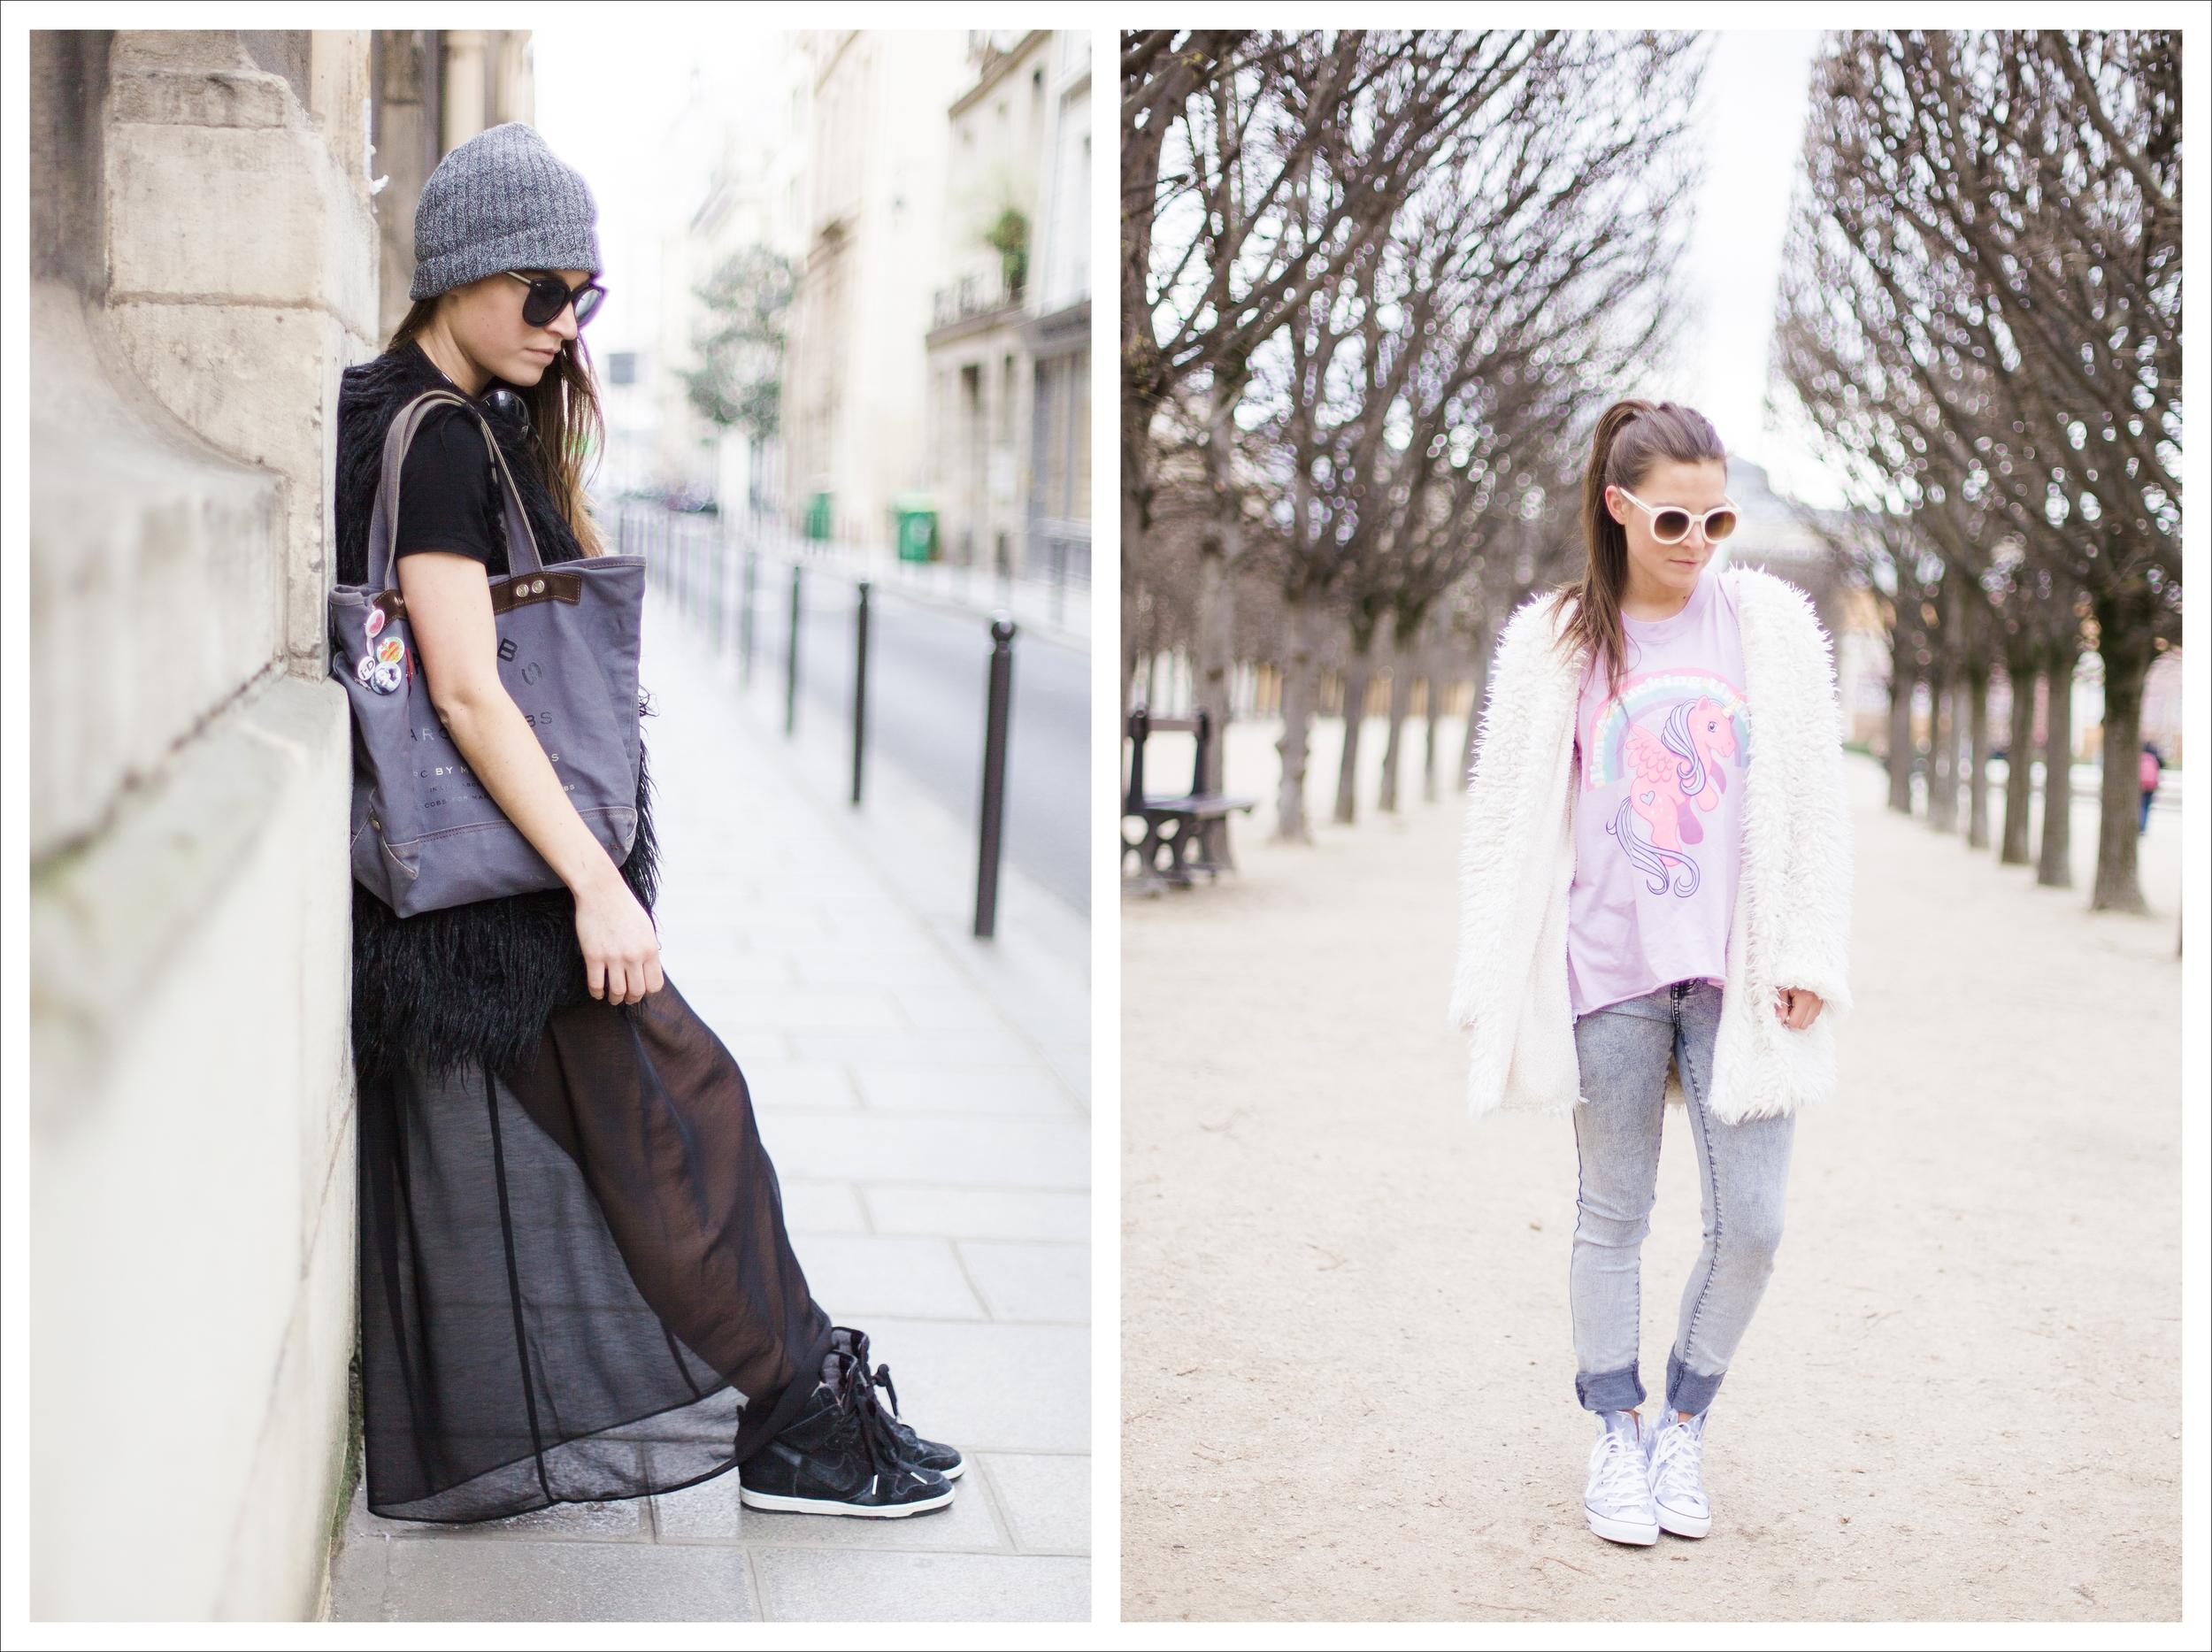 Photoshoot Paris France